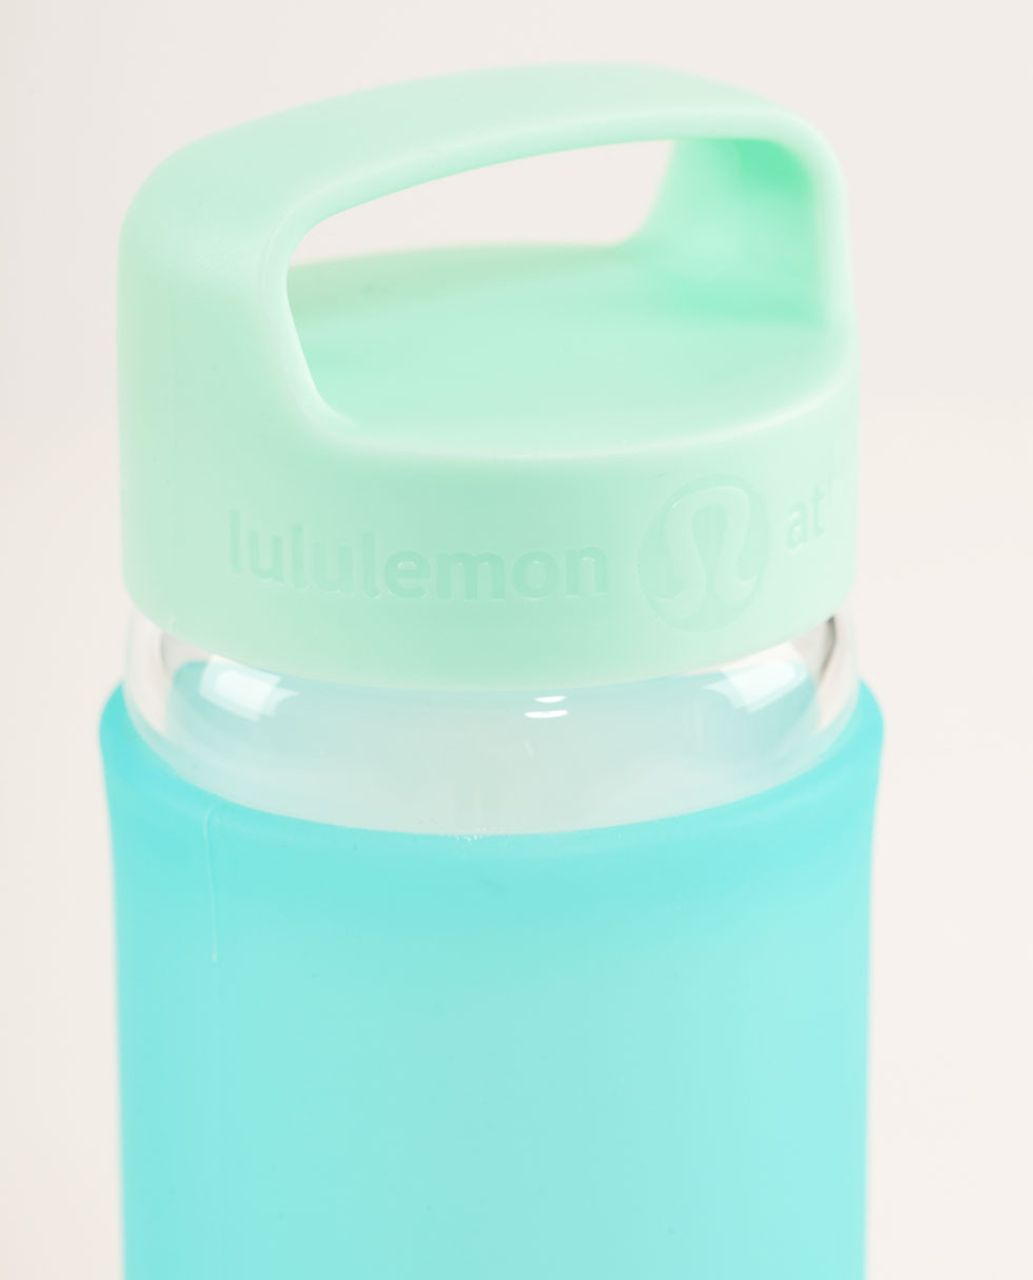 Lululemon Pure Balance Water Bottle - Peacock Blue / Sea Mist